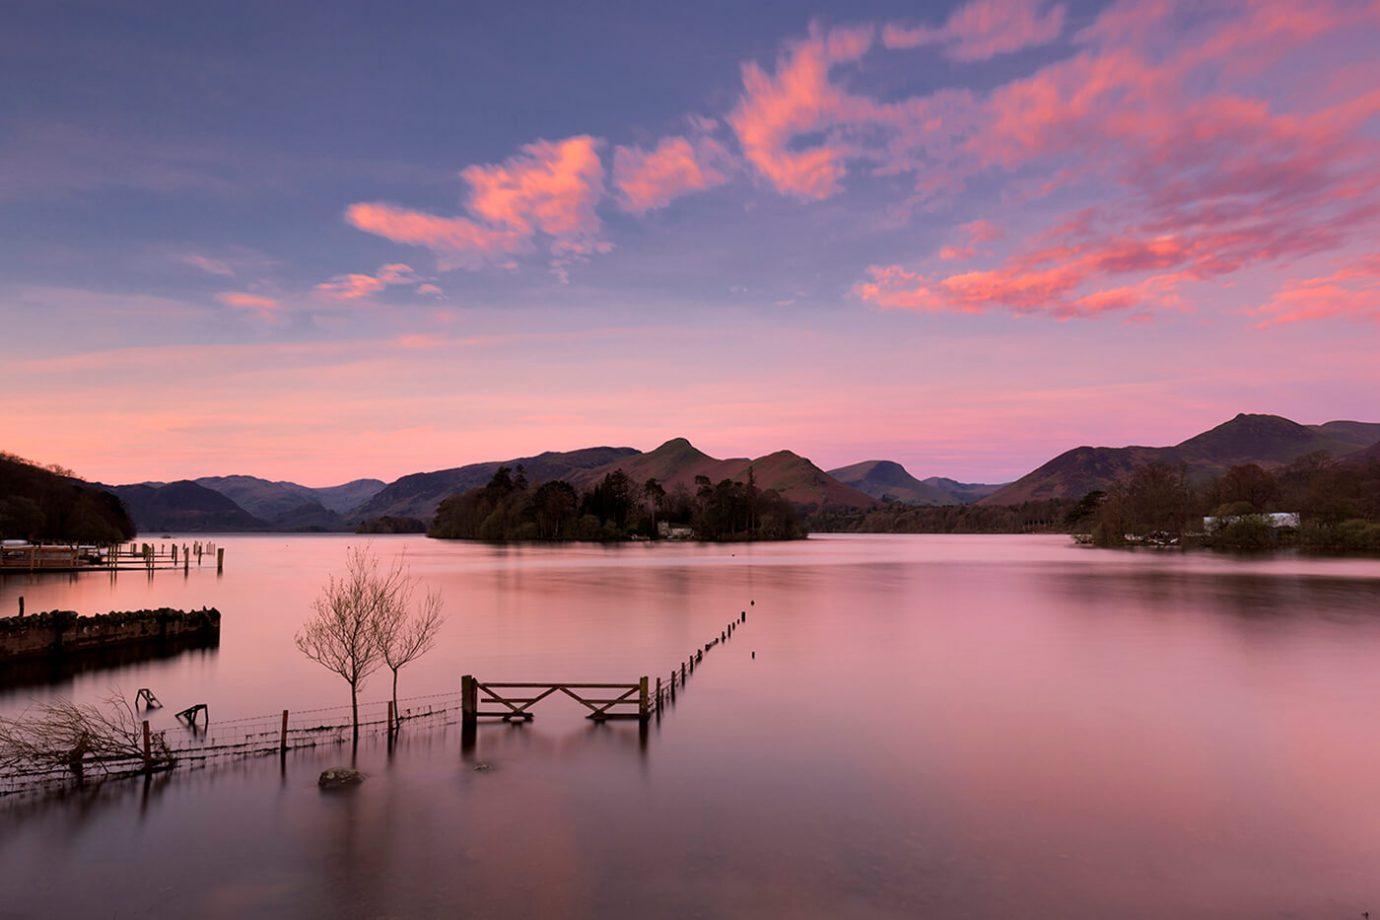 Crow Park, Derwentwater, Keswick, Lake District